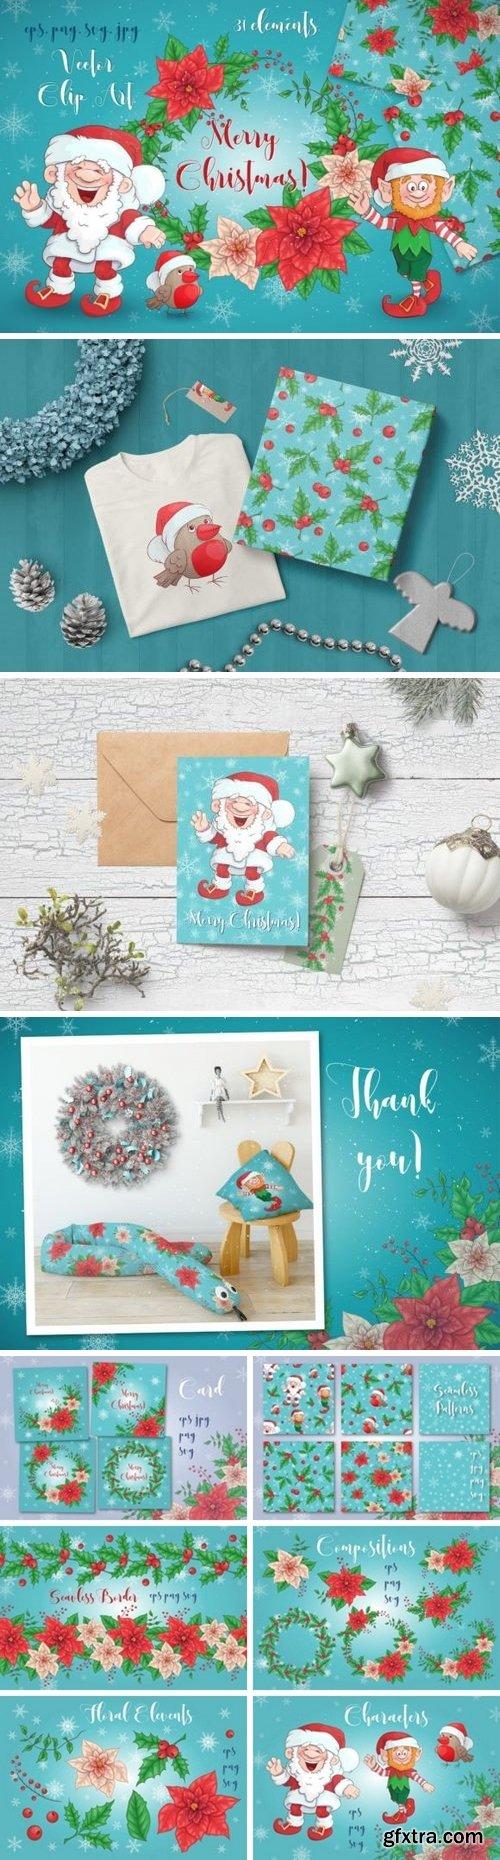 Thehungryjpeg - Merry Christmas Bundle 4 3504683